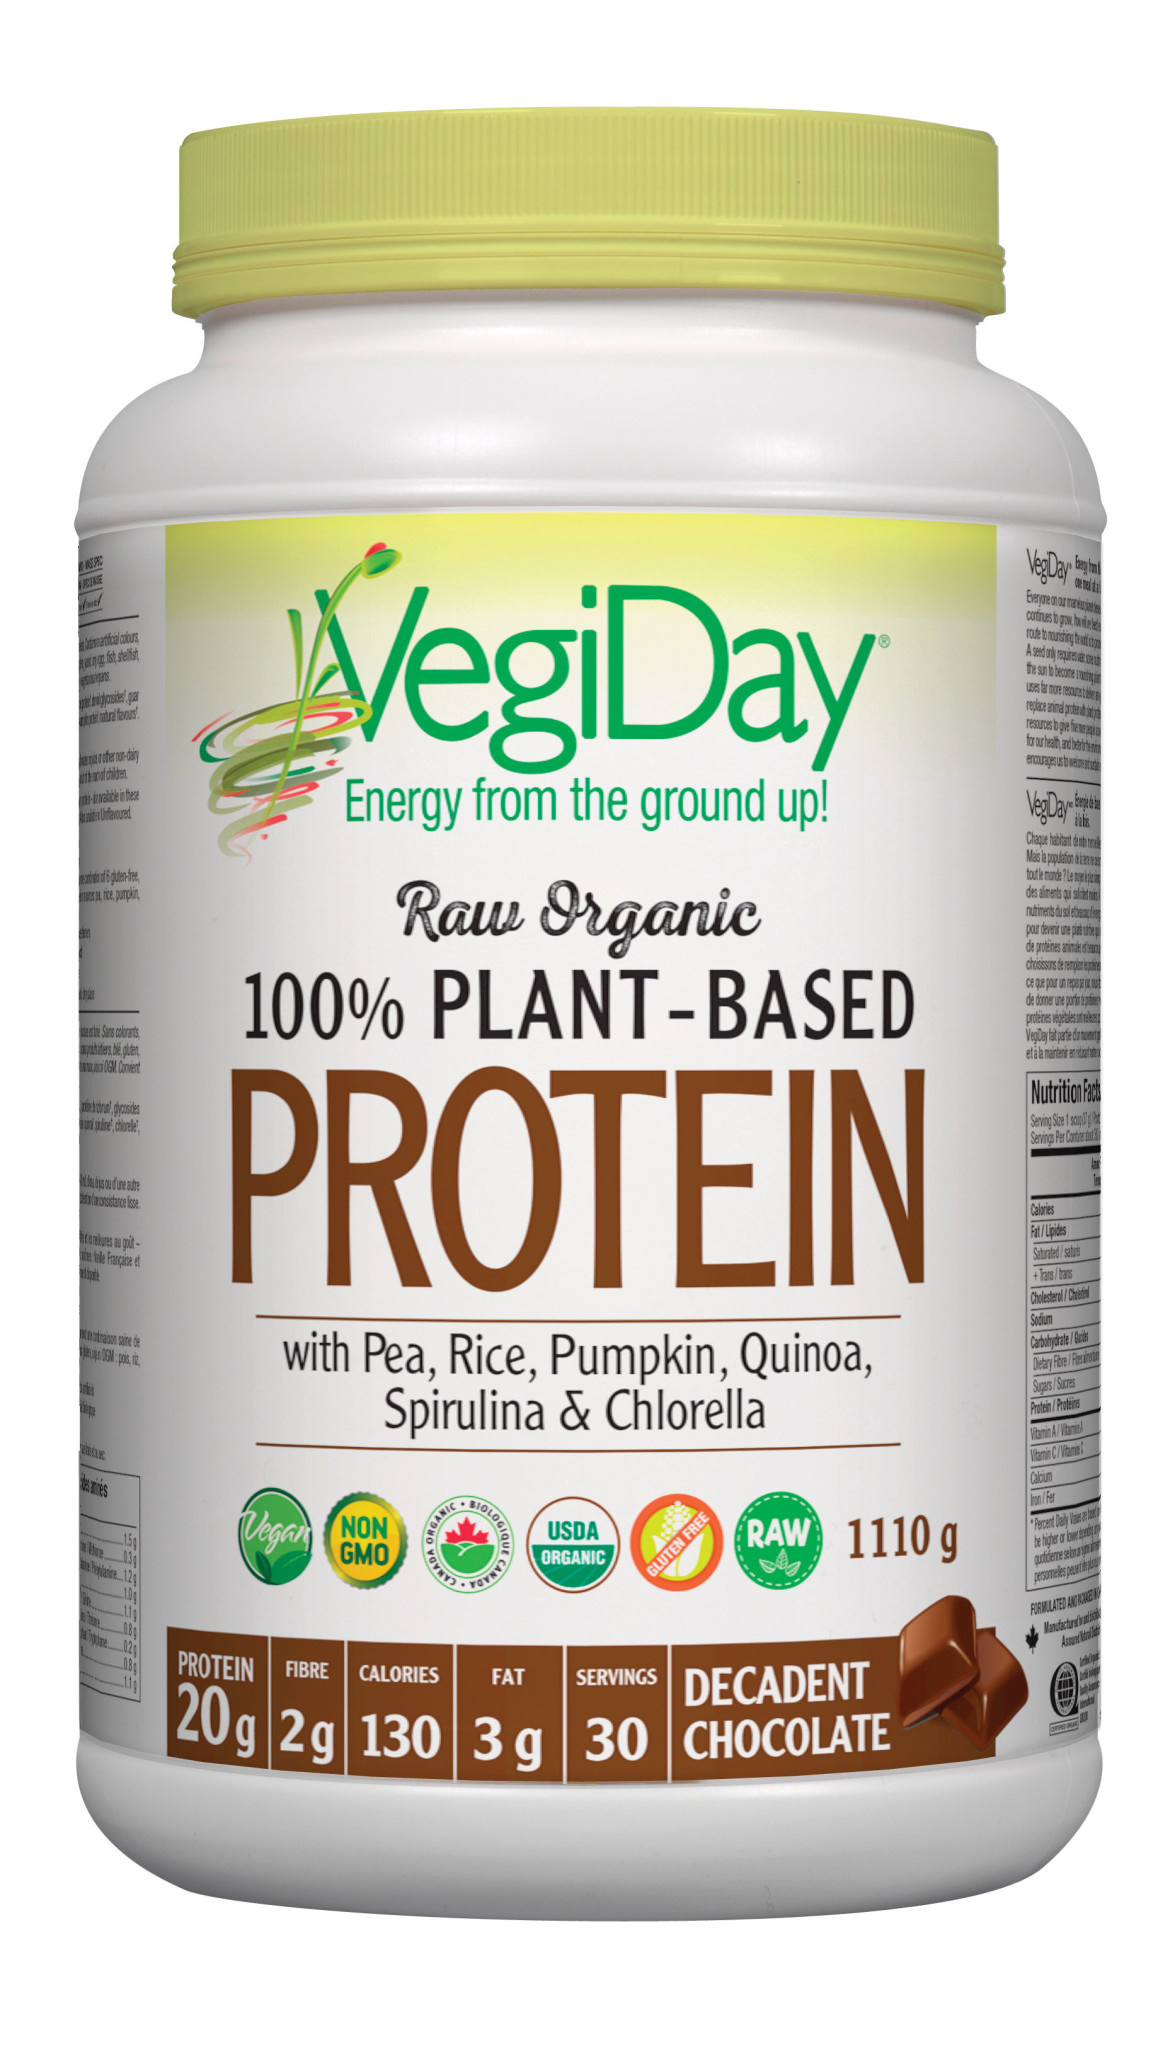 VegiDay VegiDay - Raw Organic Plant Based Protein - Decadent Chocolate - 972g